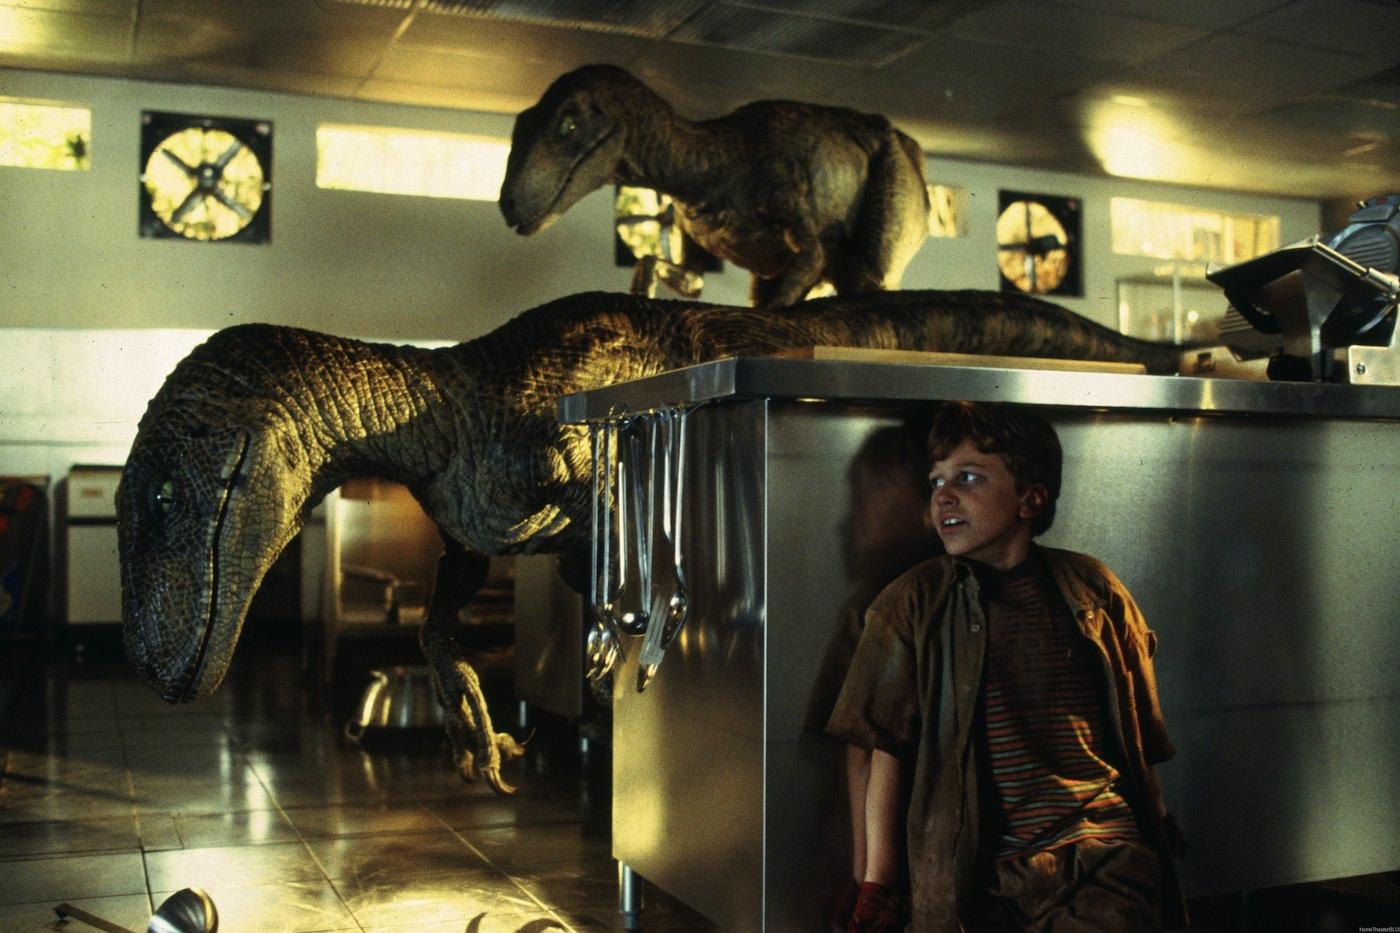 Jurassic park joseph mazzello